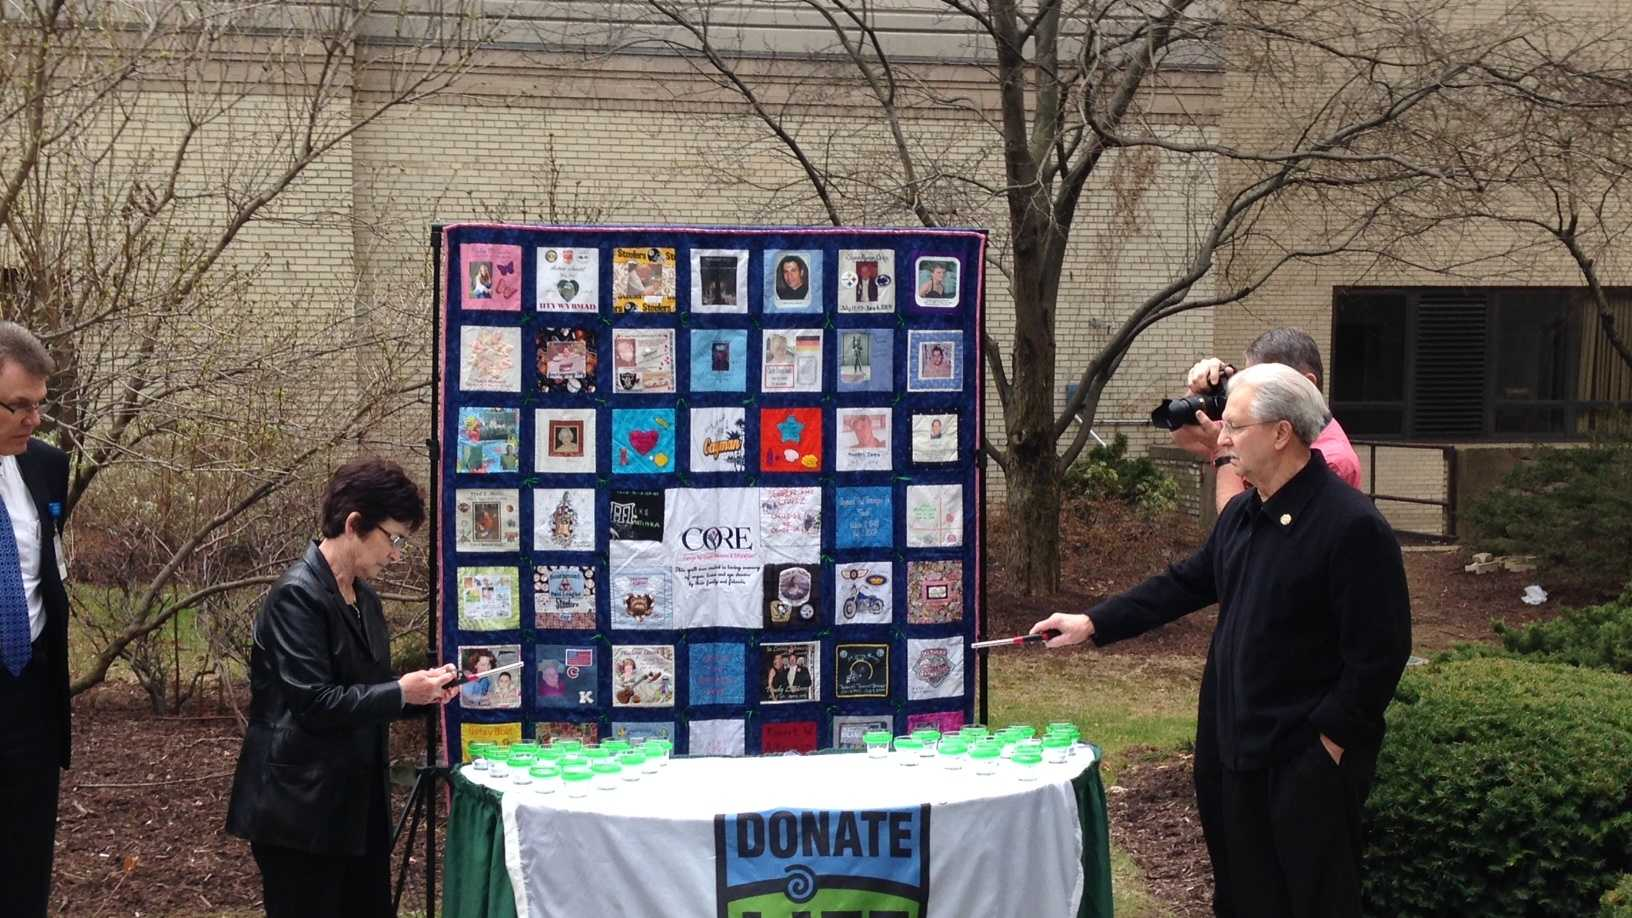 Organ donation event